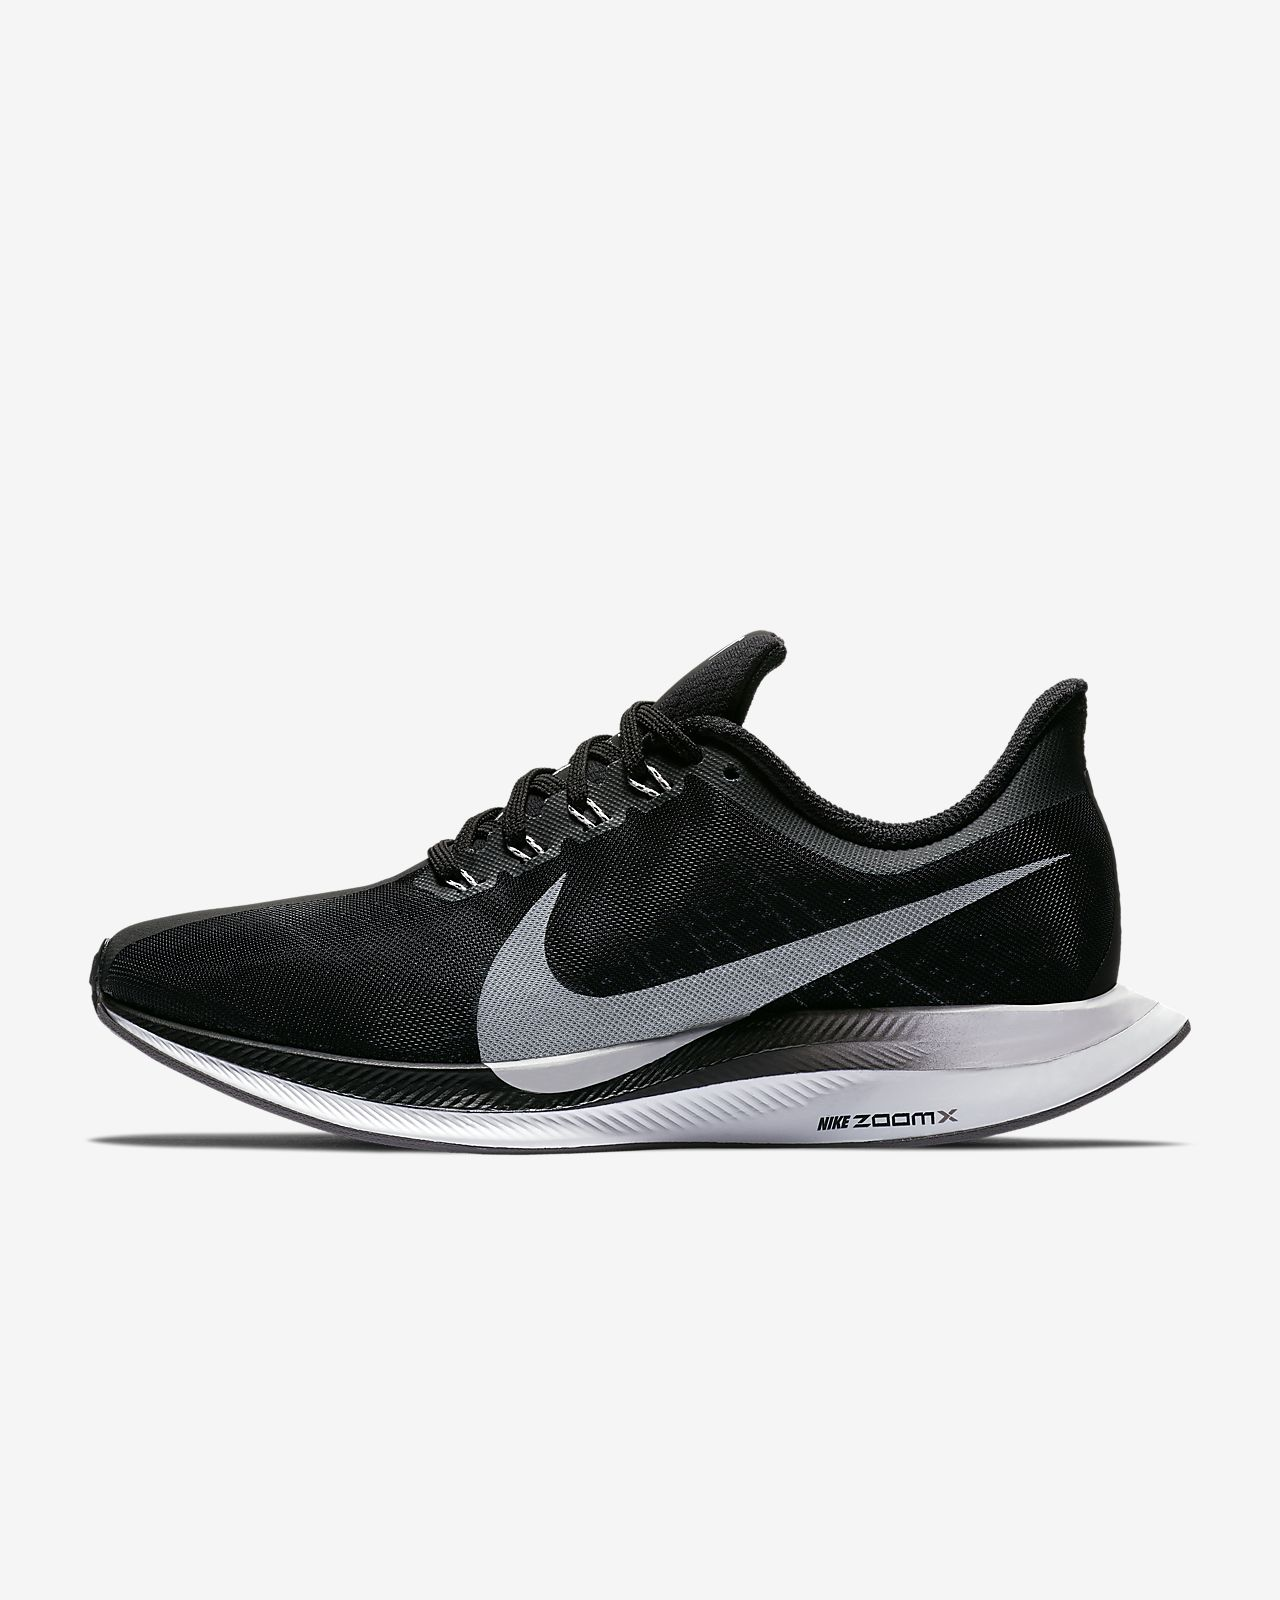 the latest 0e677 6bb27 ... Löparsko Nike Zoom Pegasus Turbo för kvinnor